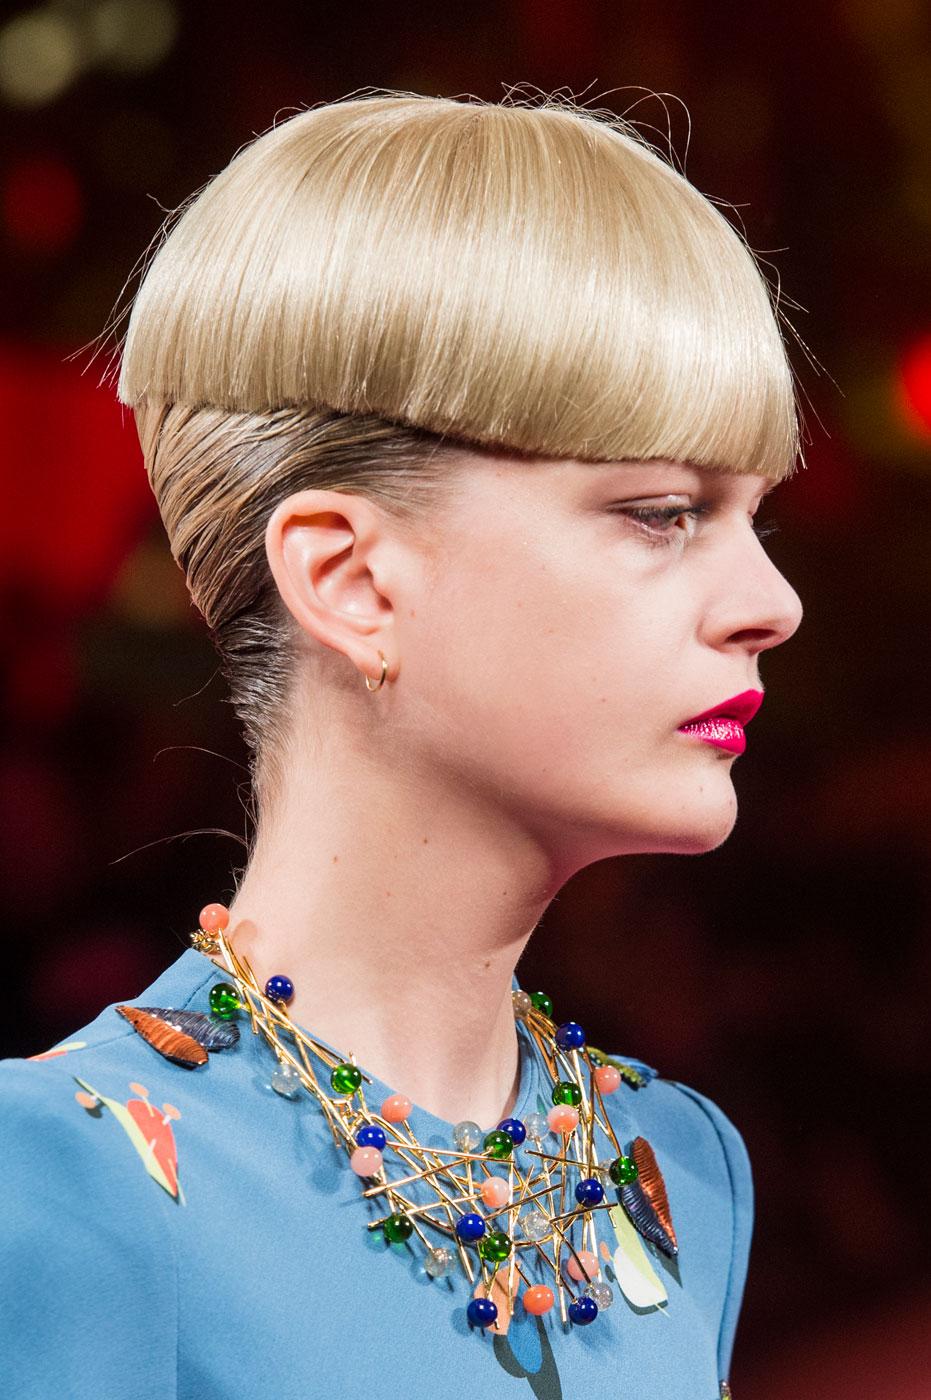 Schiaparelli-fashion-runway-show-close-ups-haute-couture-paris-spring-summer-2015-the-impression-39